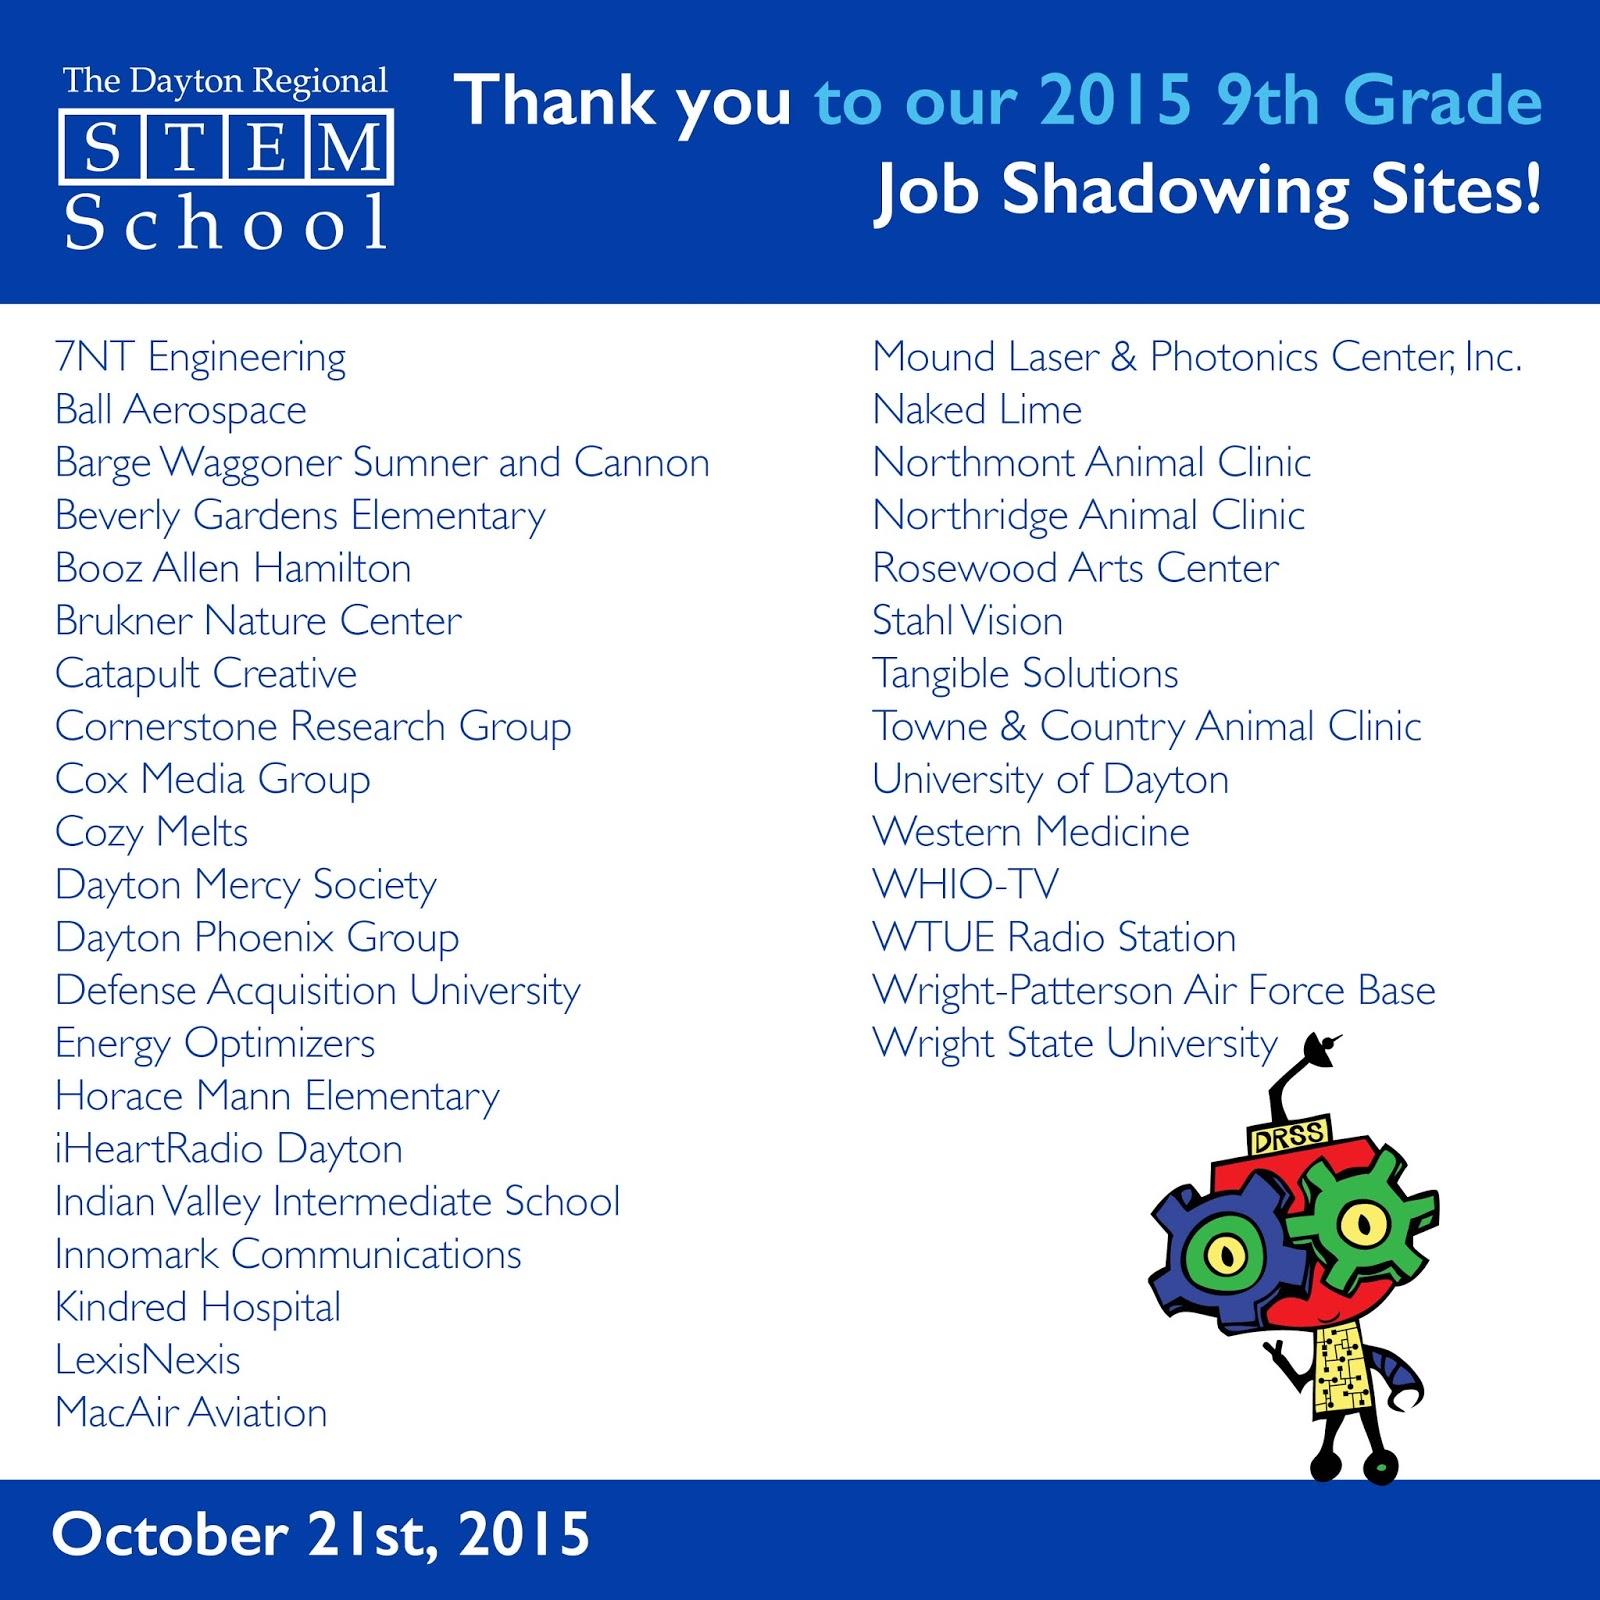 Dayton Stem School: Dayton Regional STEM School News And Events: 2015 9th